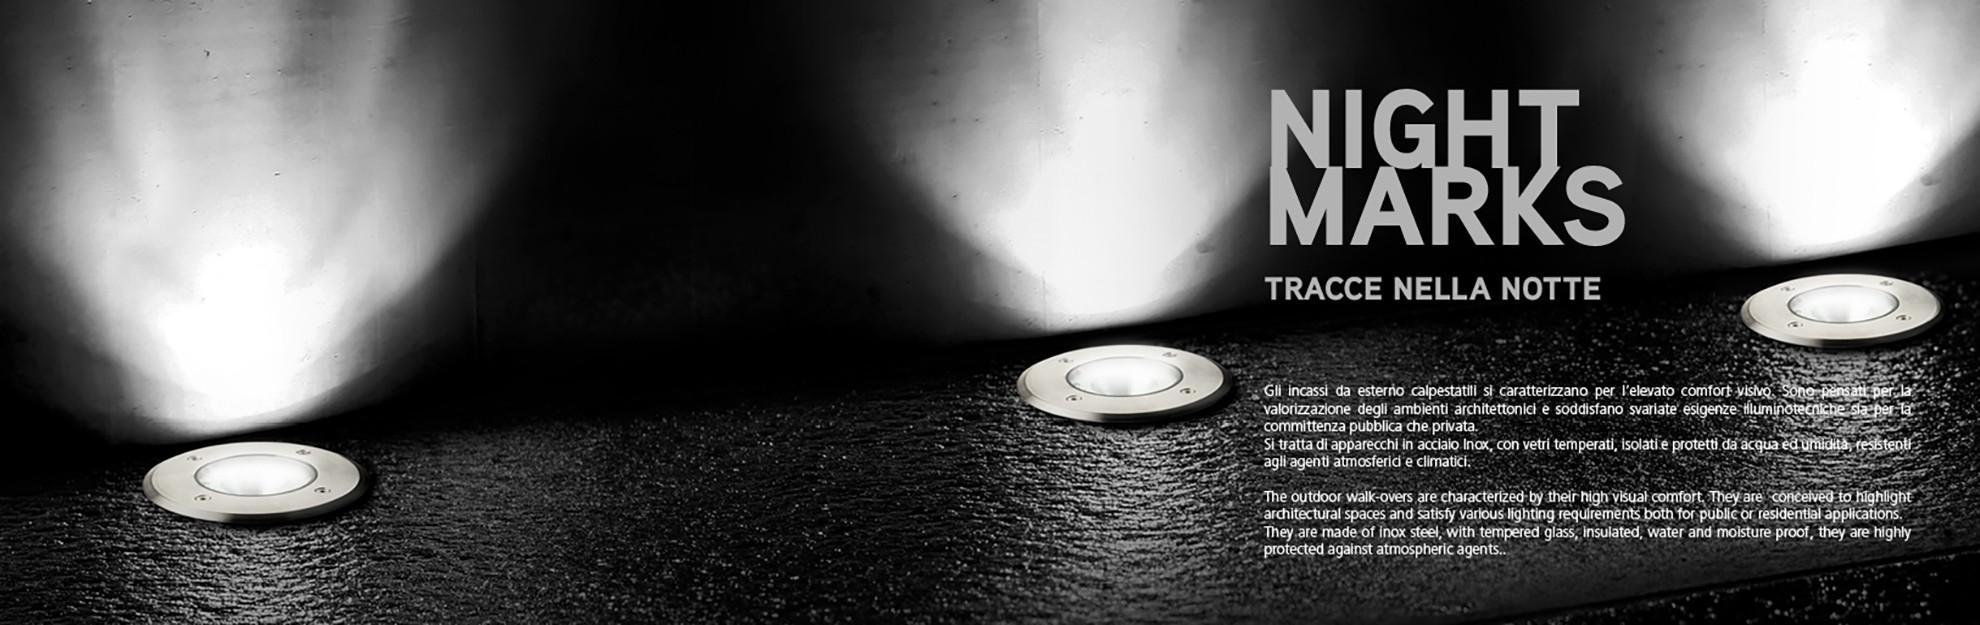 Marino Cristal   Home - Bulbs and accessories, Homega, MC luce ...